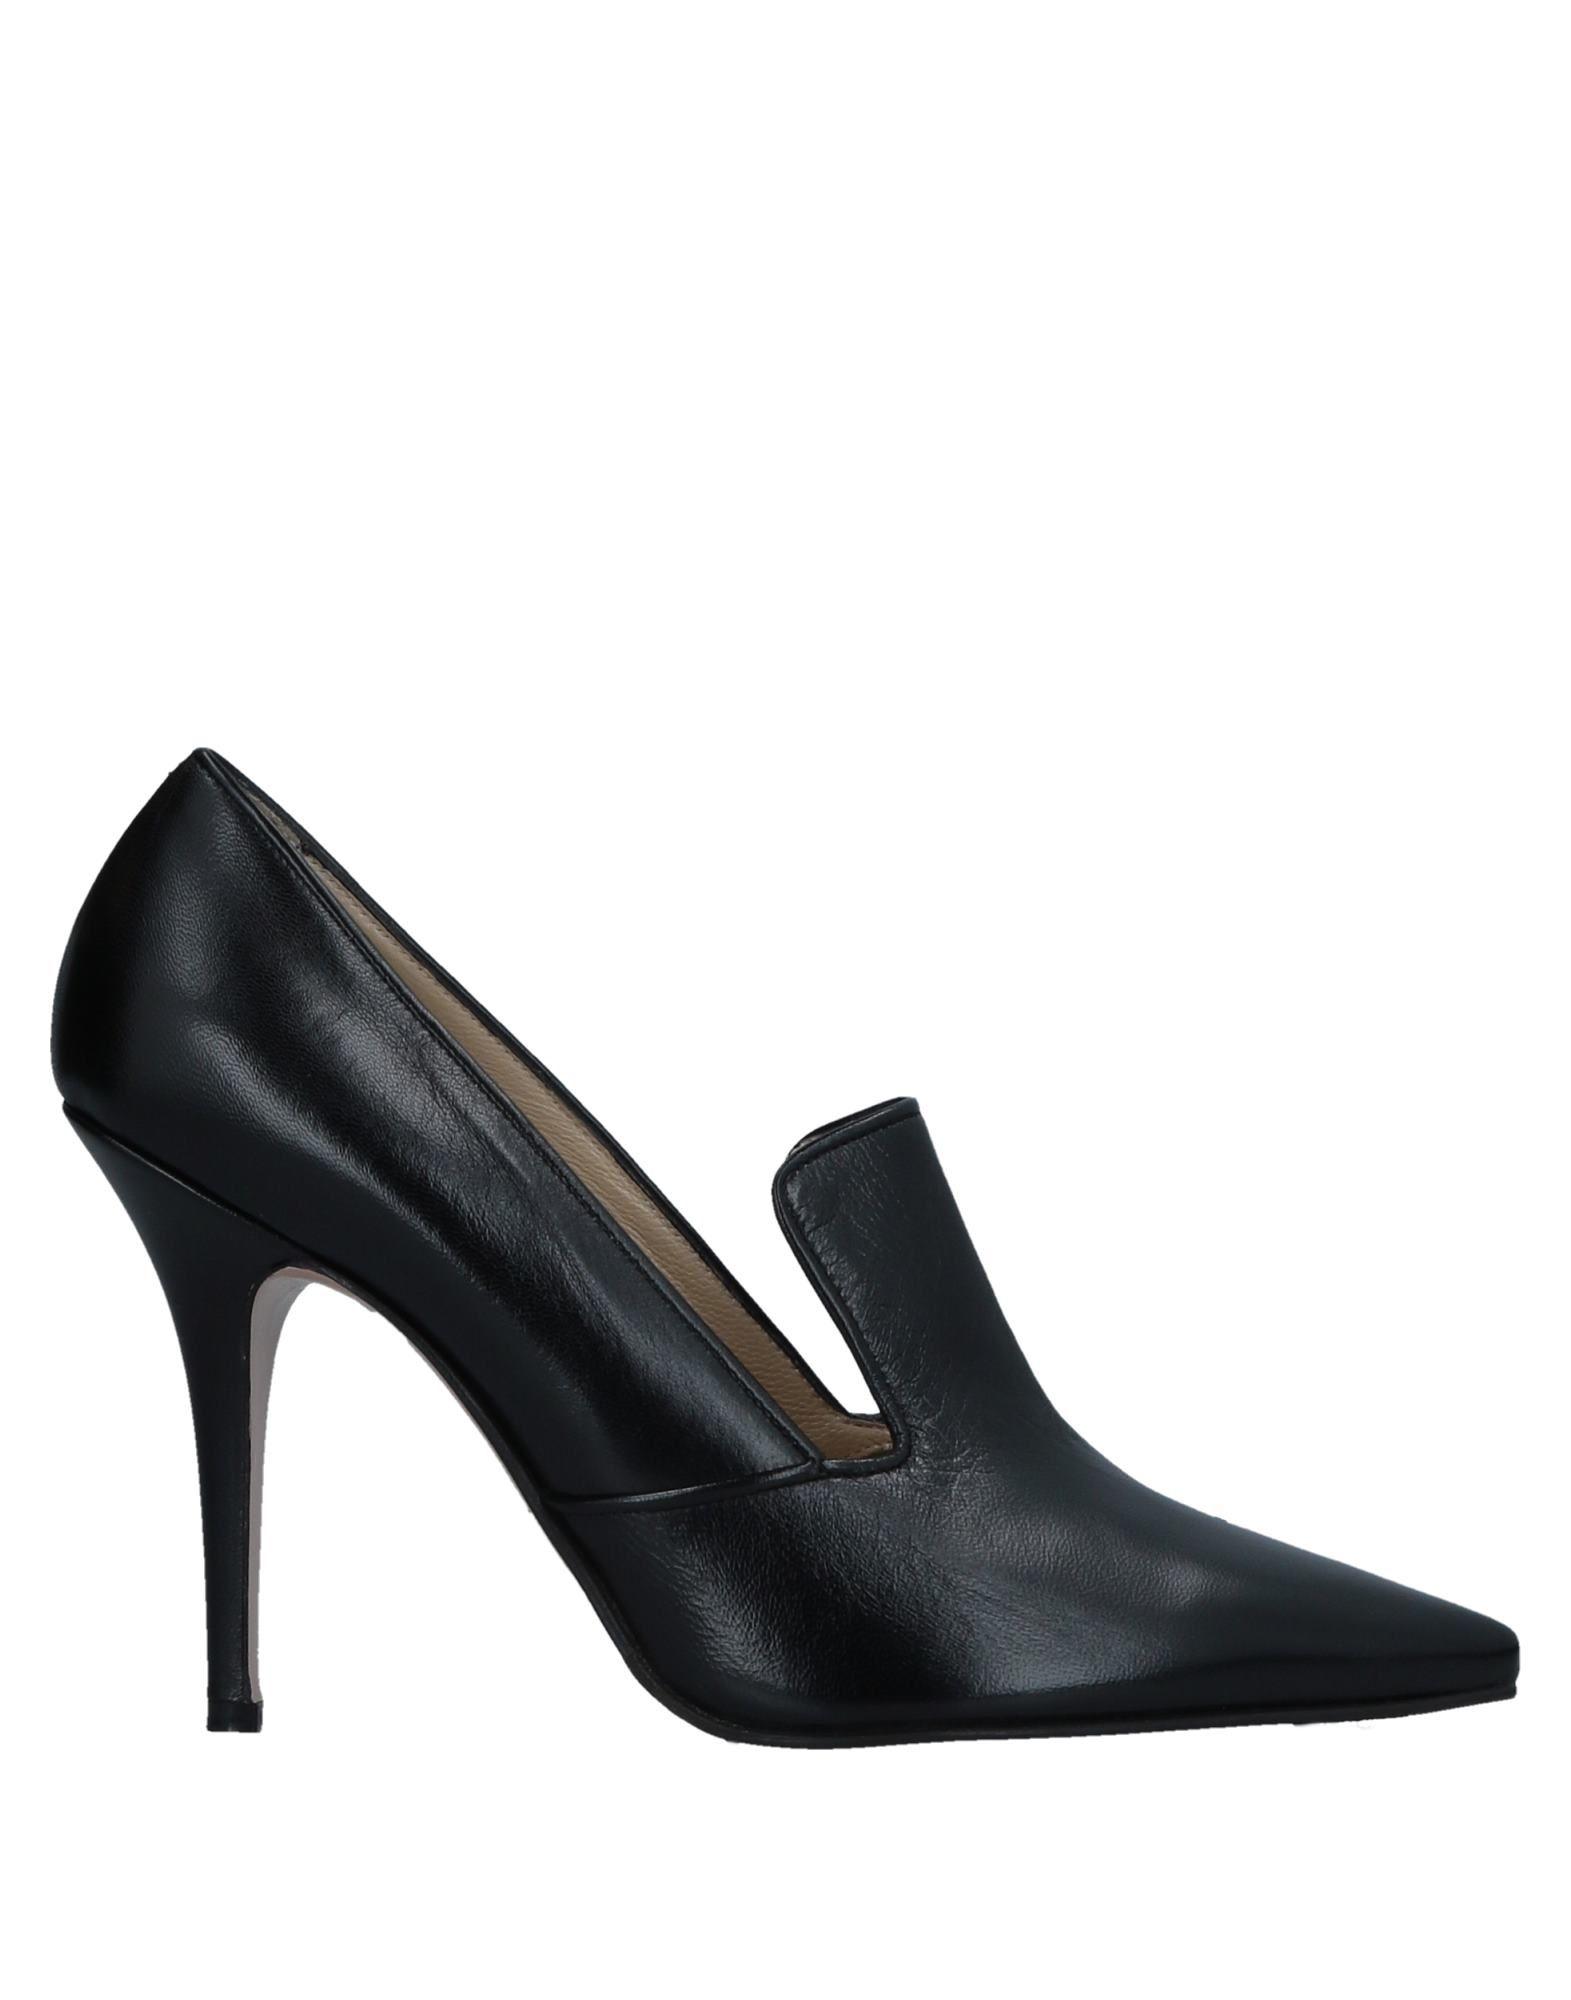 Moda Mocassino Rouge Donna Donna Rouge - 11525568JA 88c0e1